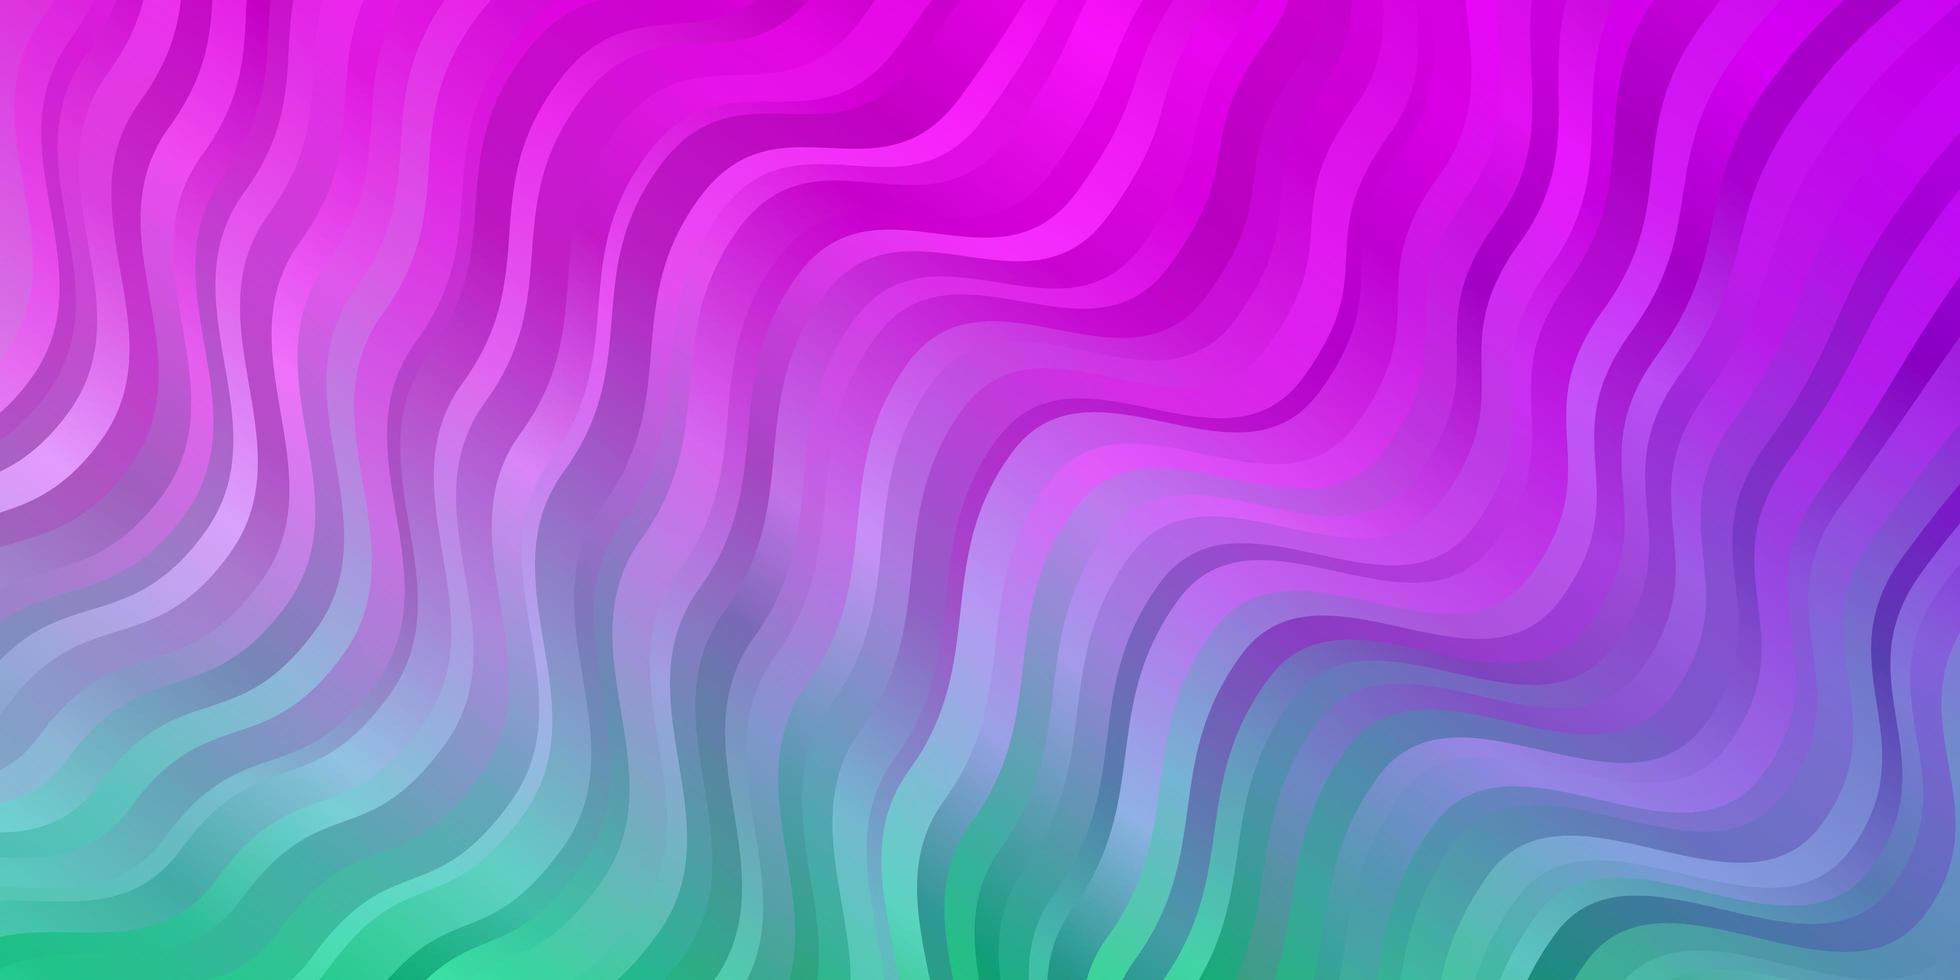 Fondo de vector de color rosa claro, verde con arco circular.